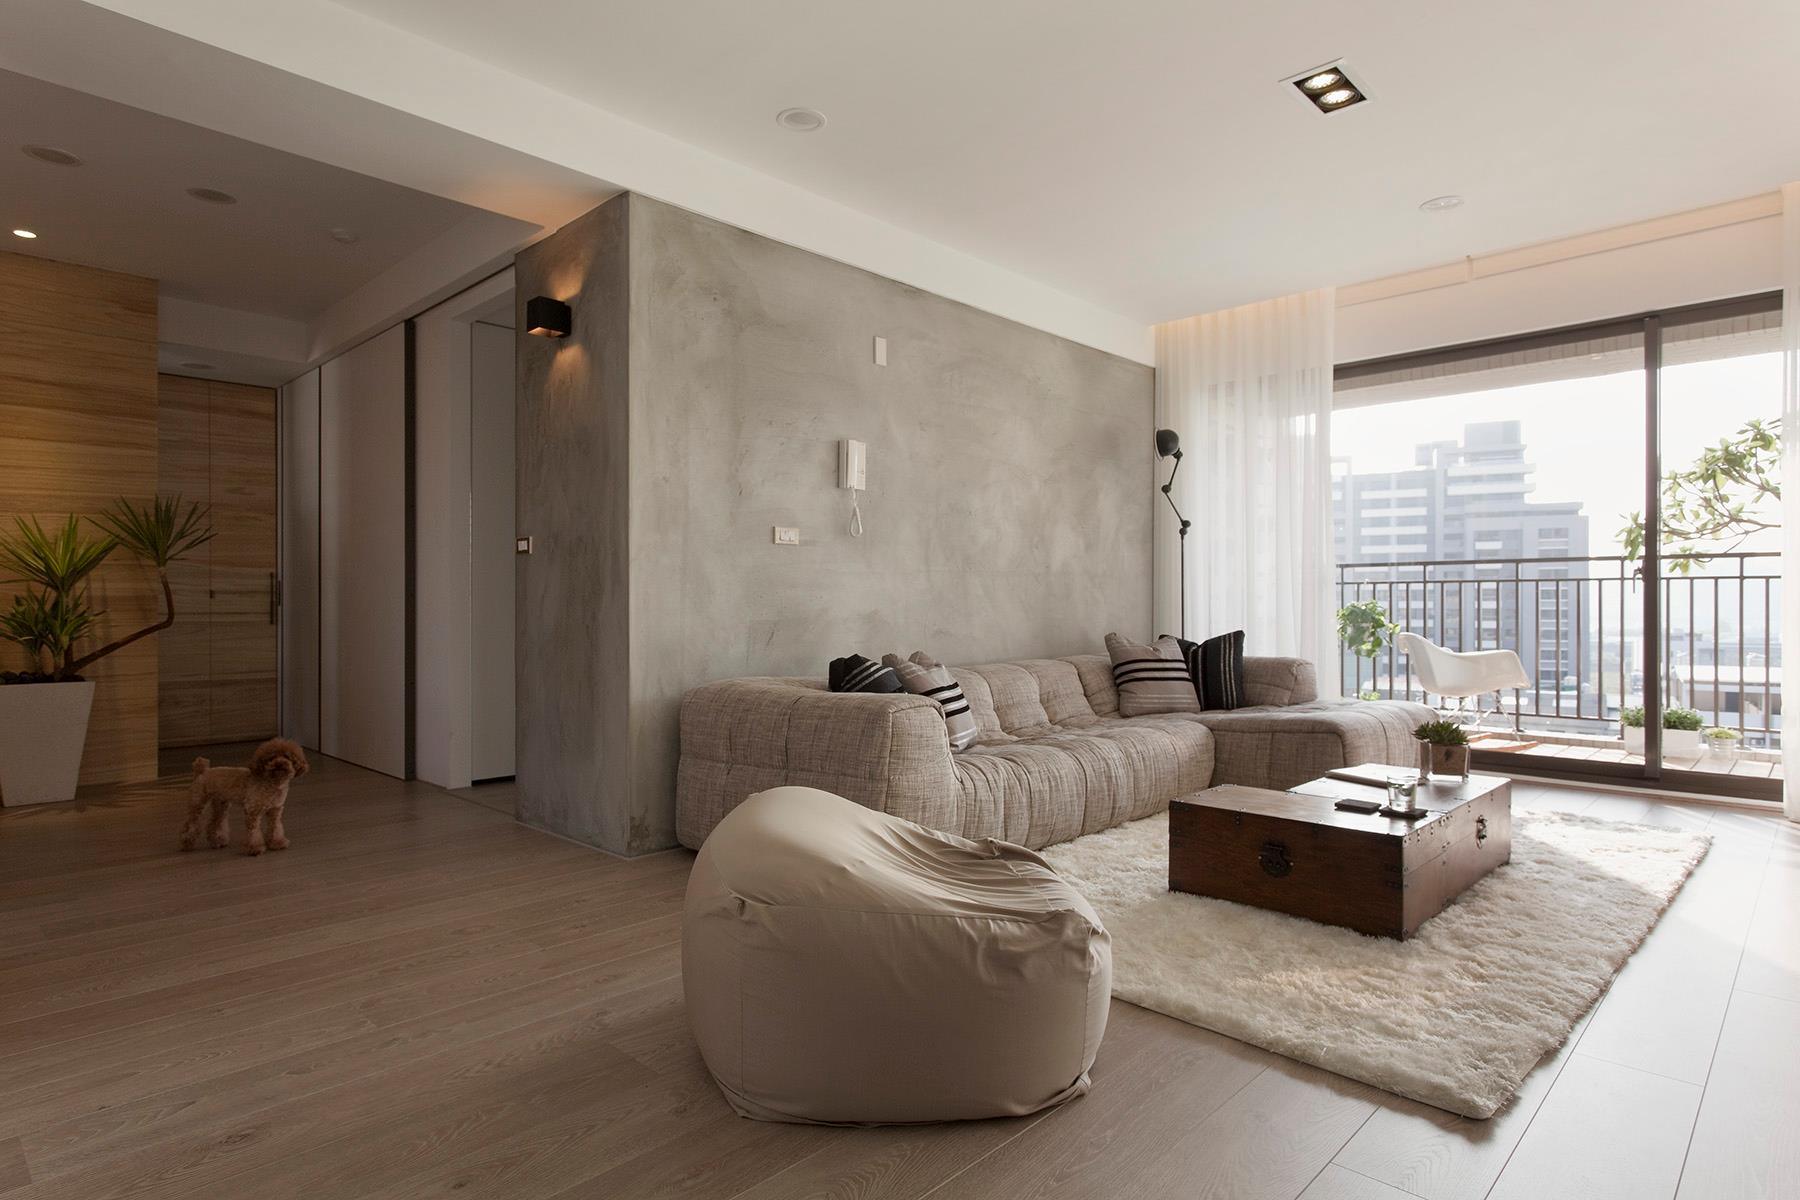 decorando-casa-concreto